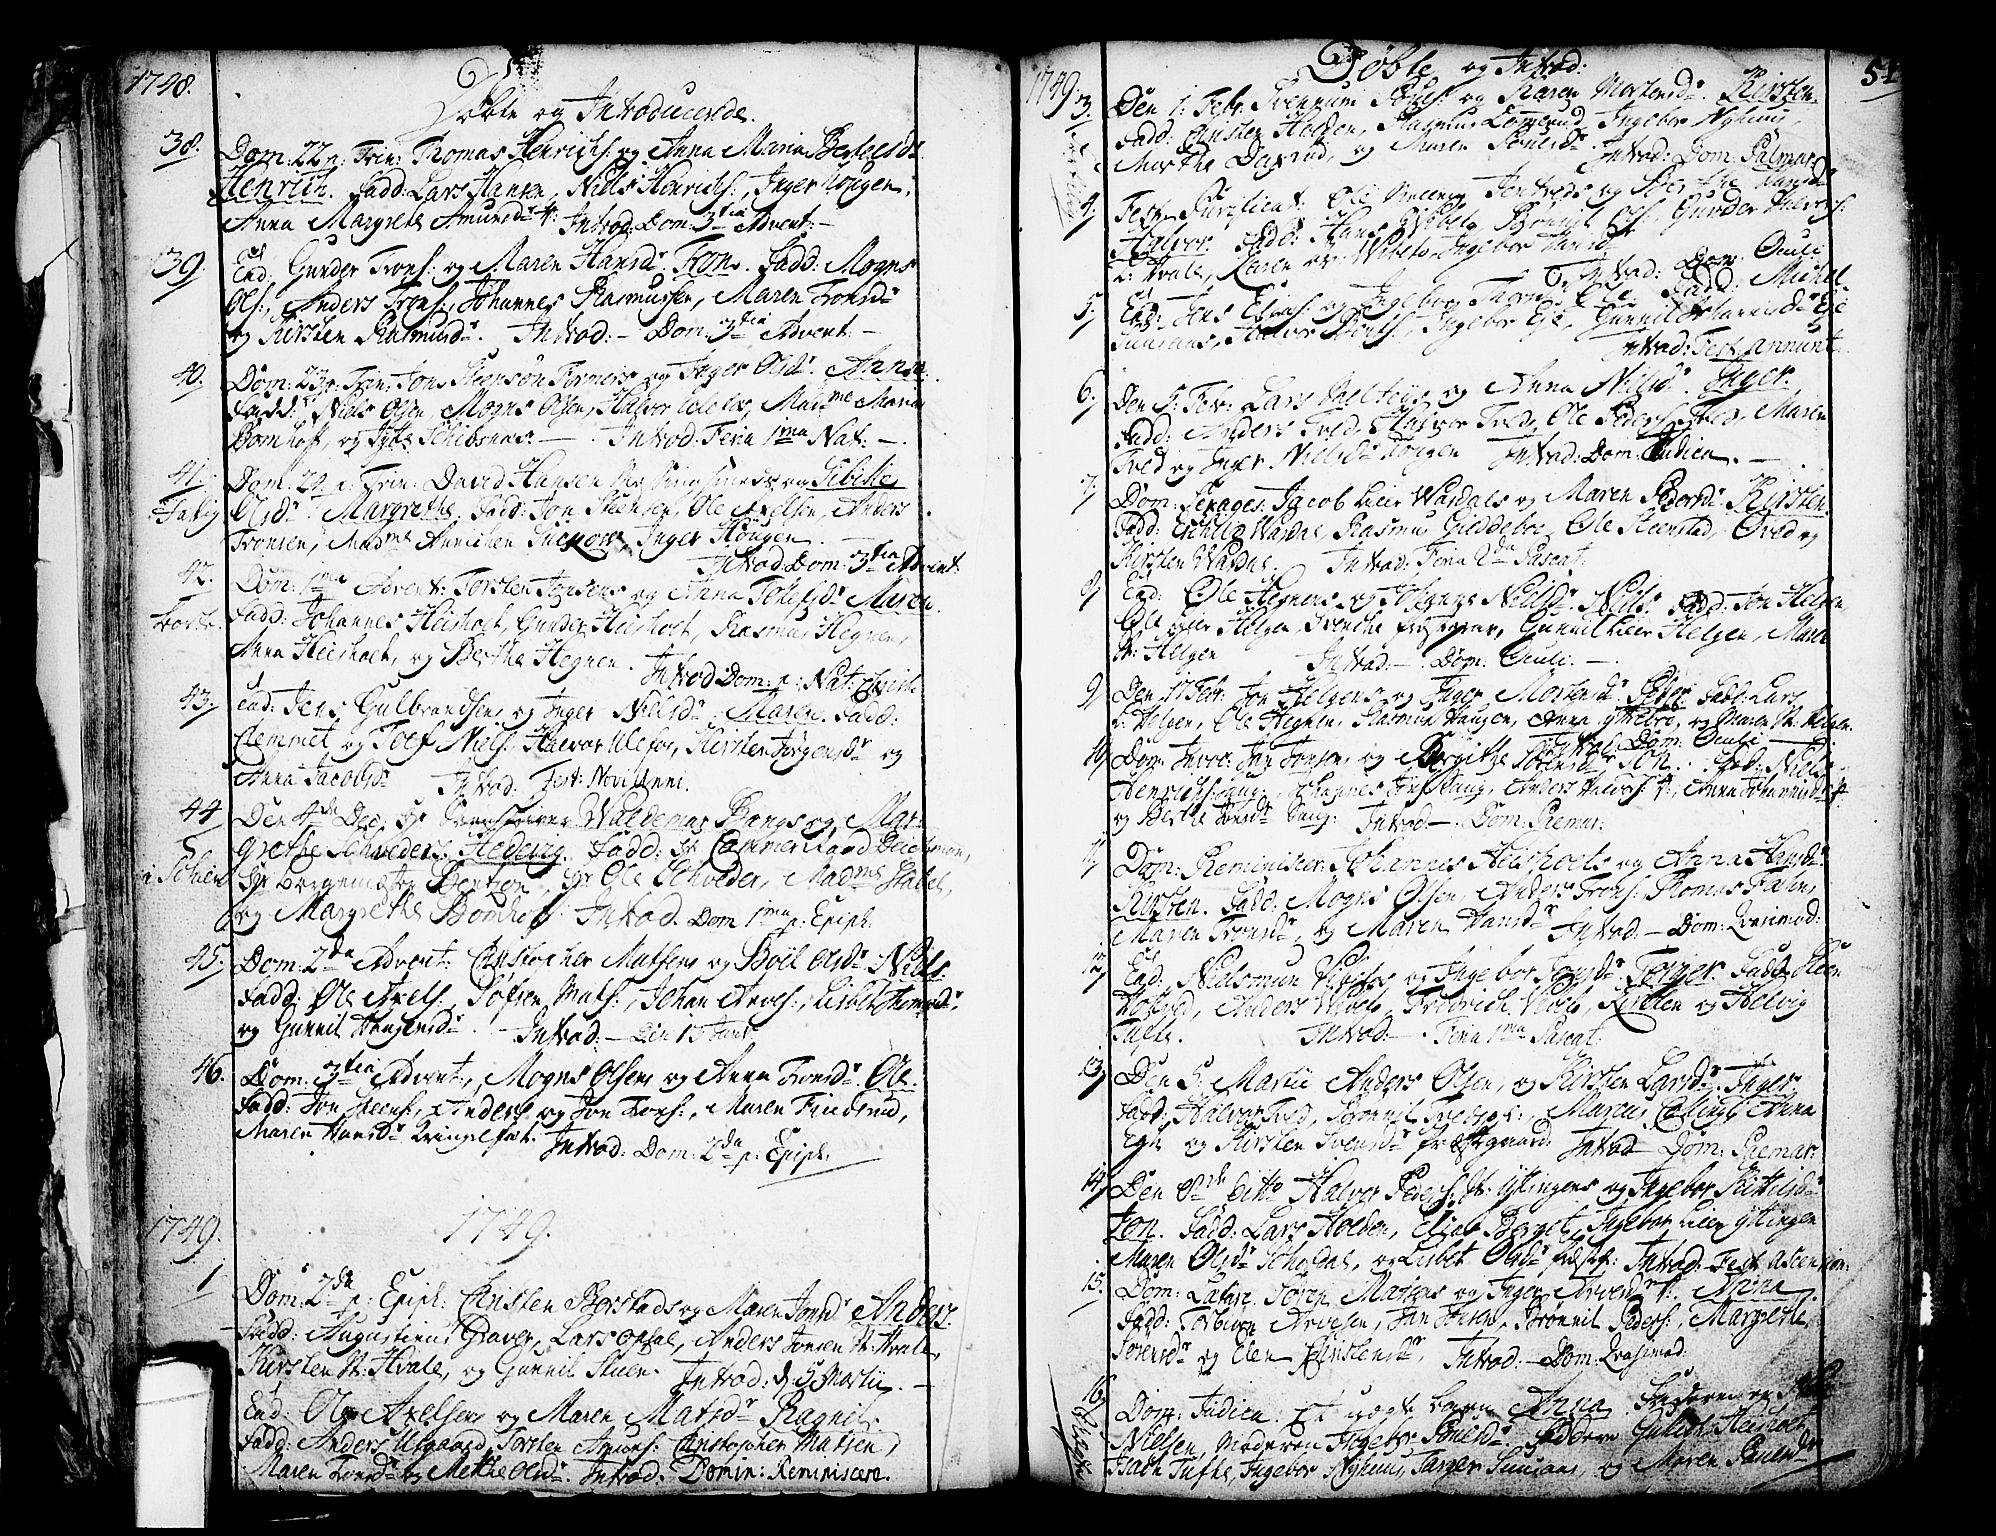 SAKO, Holla kirkebøker, F/Fa/L0001: Ministerialbok nr. 1, 1717-1779, s. 51